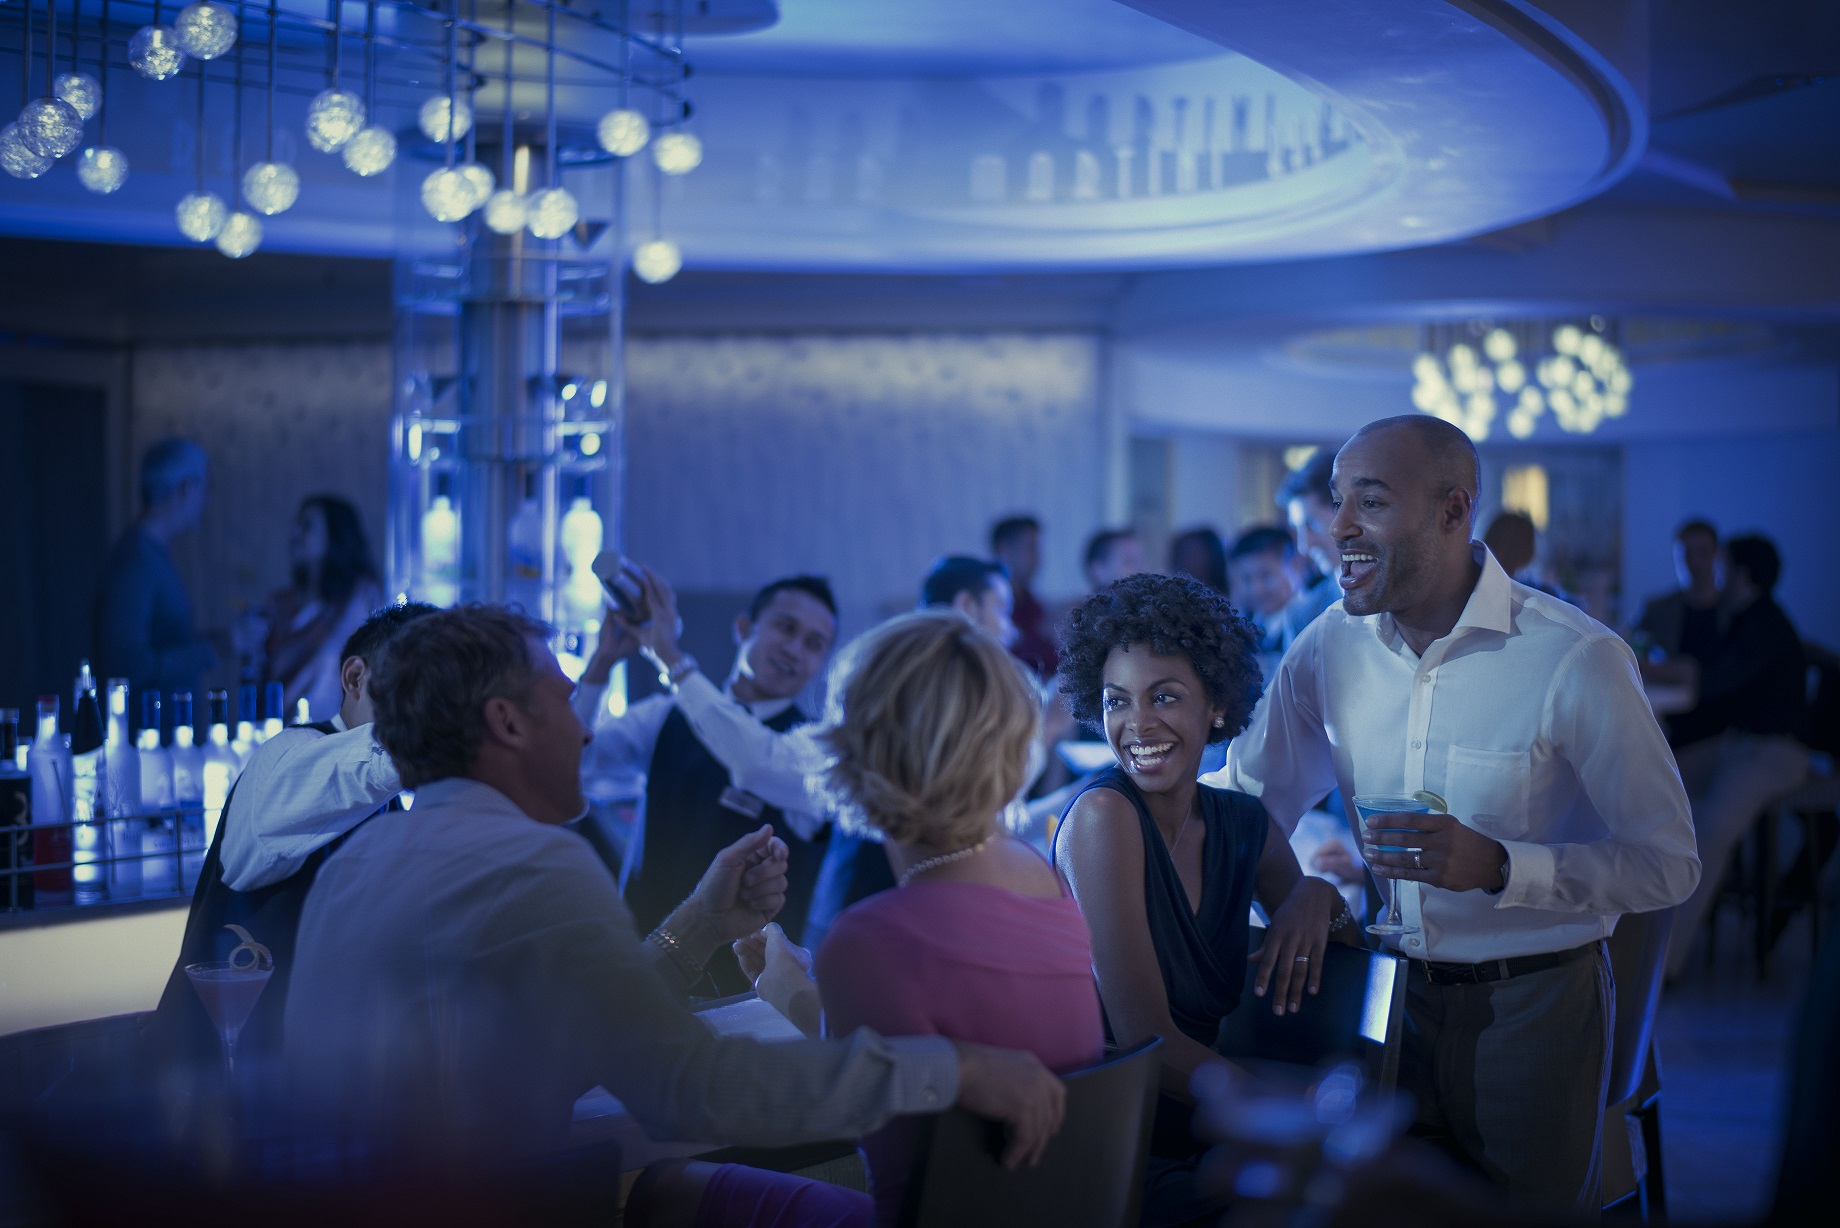 Celebrity Solstice martini bar kvällstid